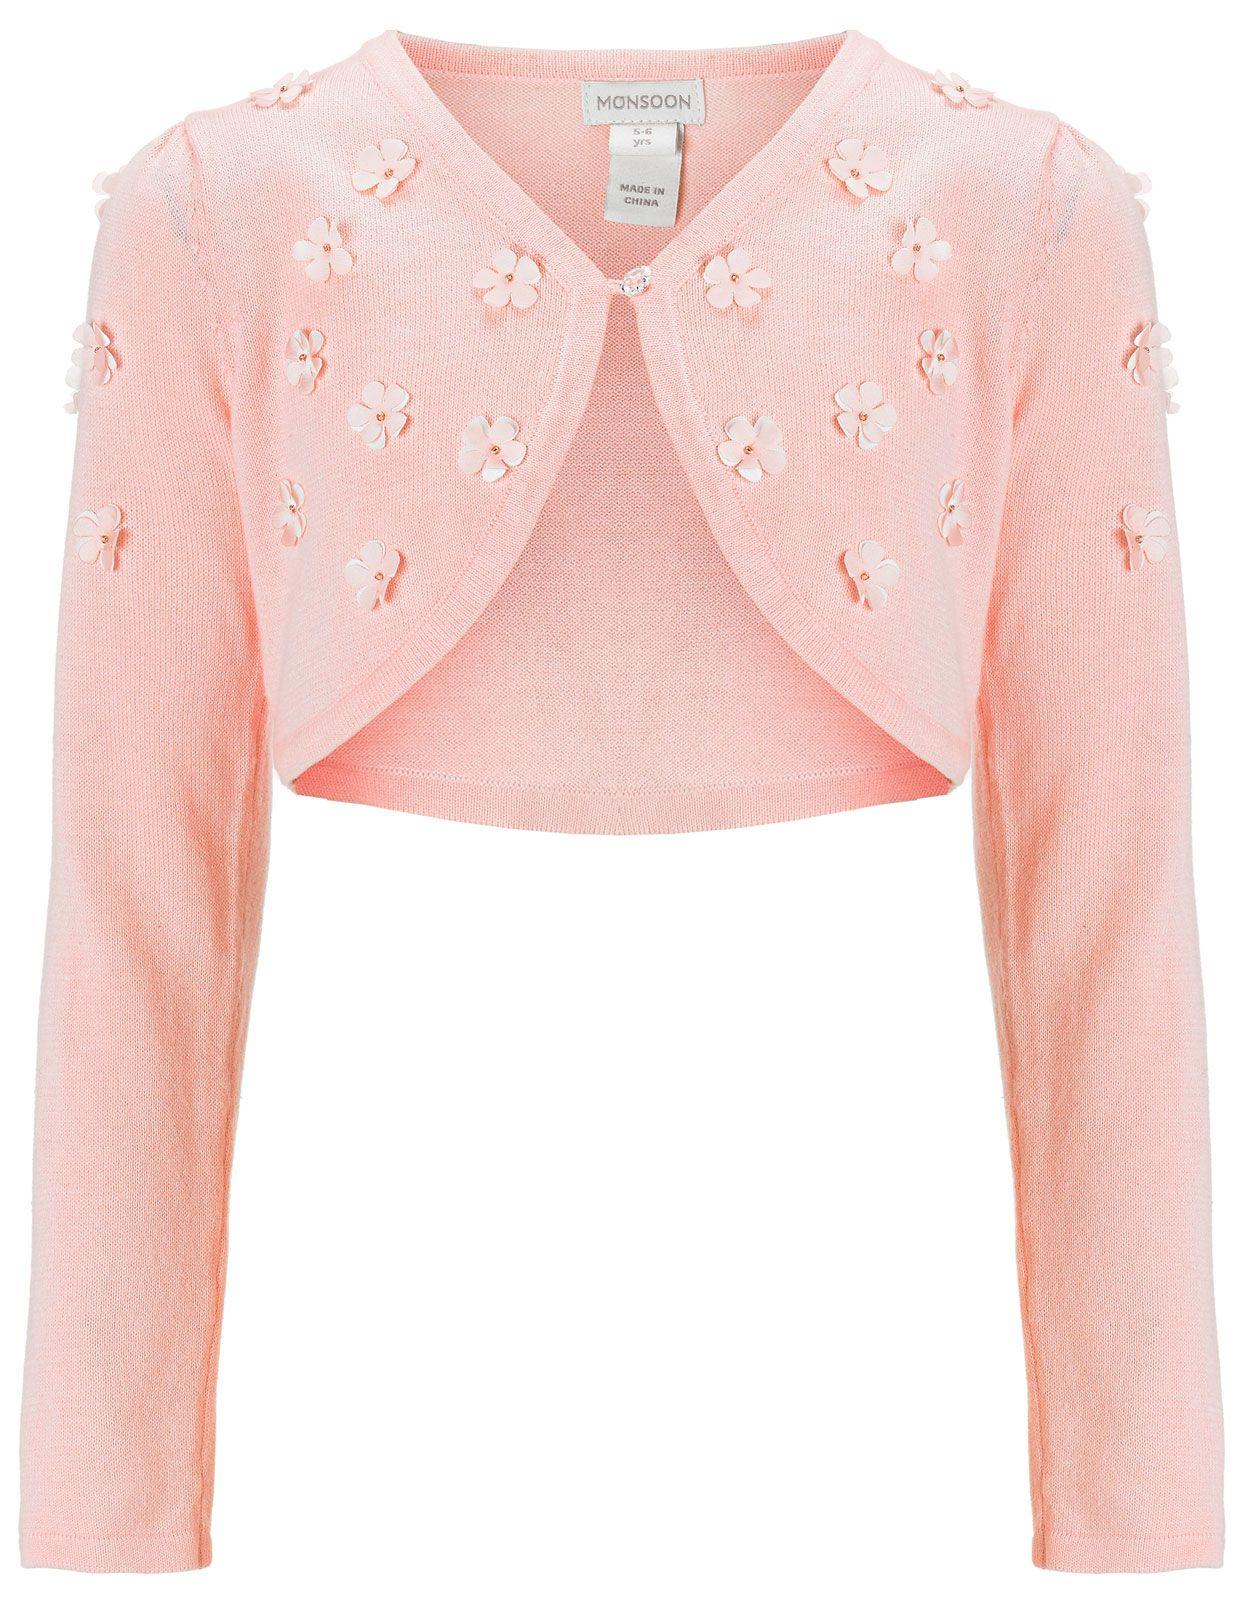 Javana Chiffon Flower Cardigan | Pink | Monsoon | Cooking ...